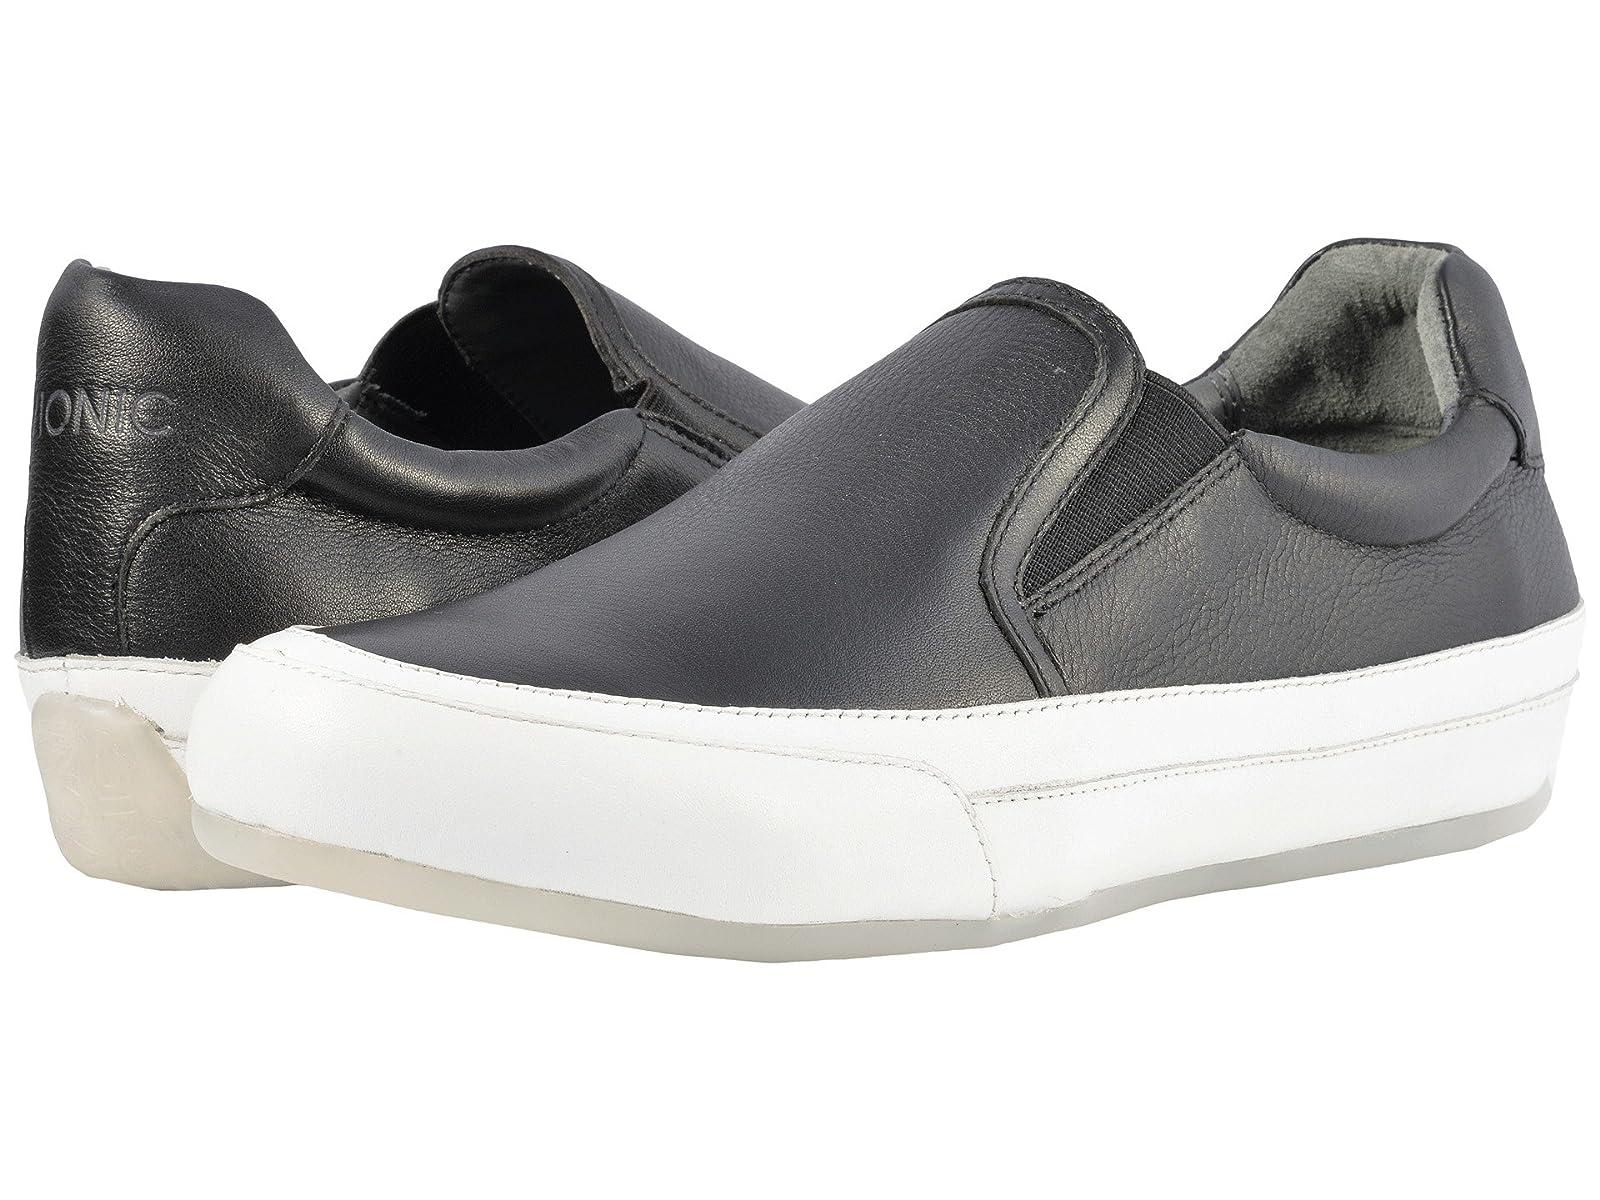 VIONIC AprilCheap and distinctive eye-catching shoes